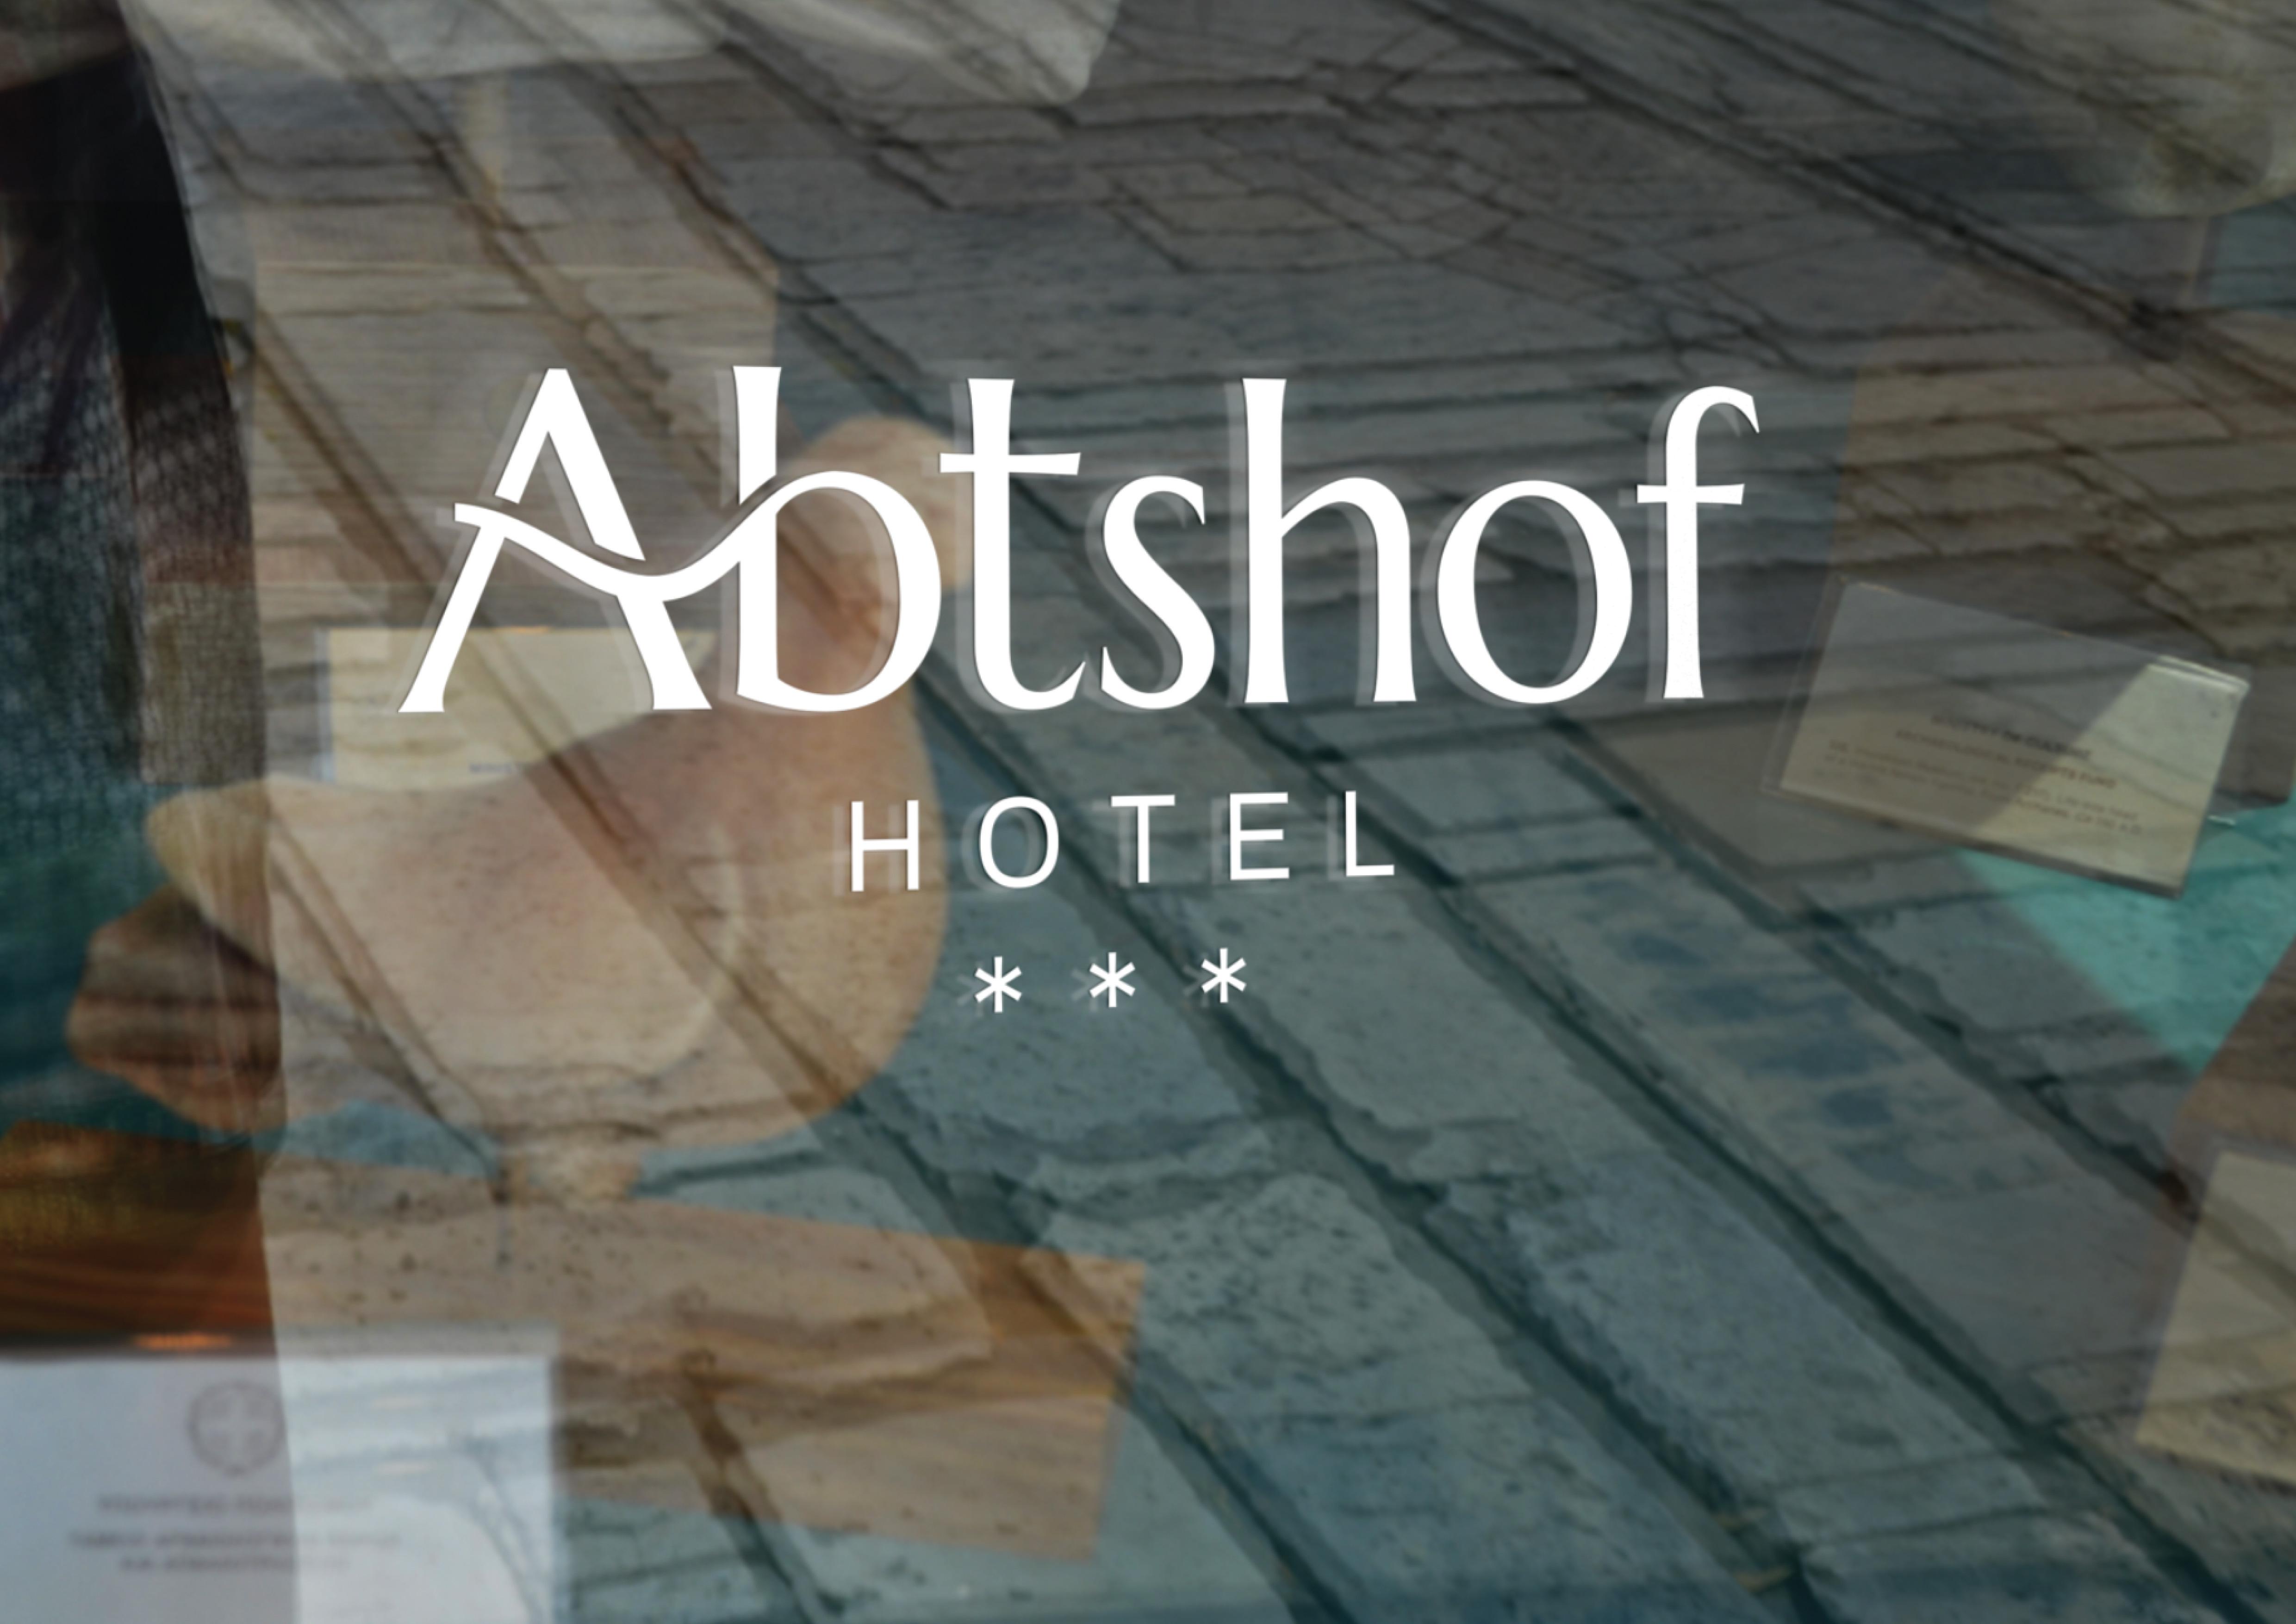 Abtshof Hotel